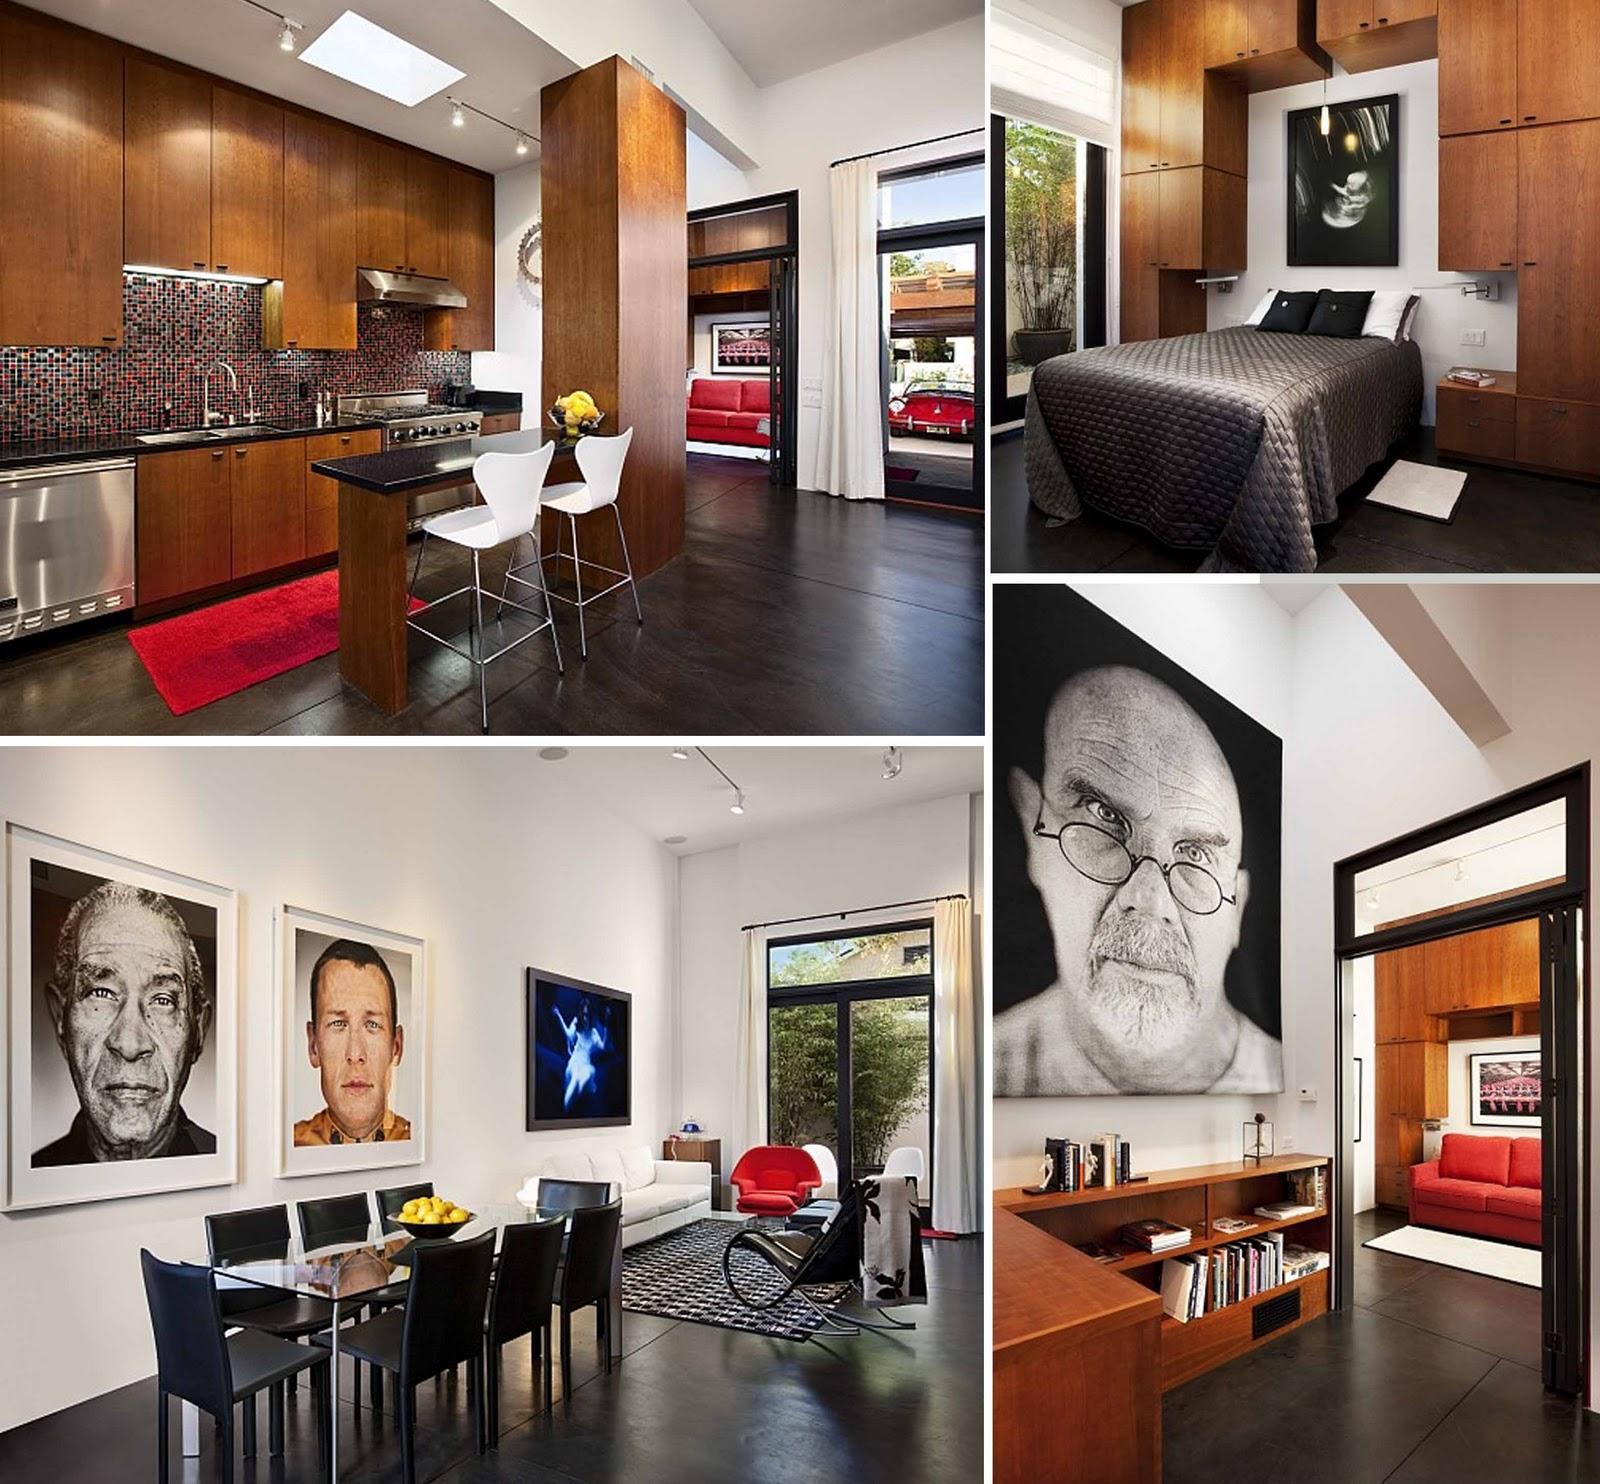 Design Intuition By Katie Hatch Santa Barbara Modern Architecture And Interior Design You